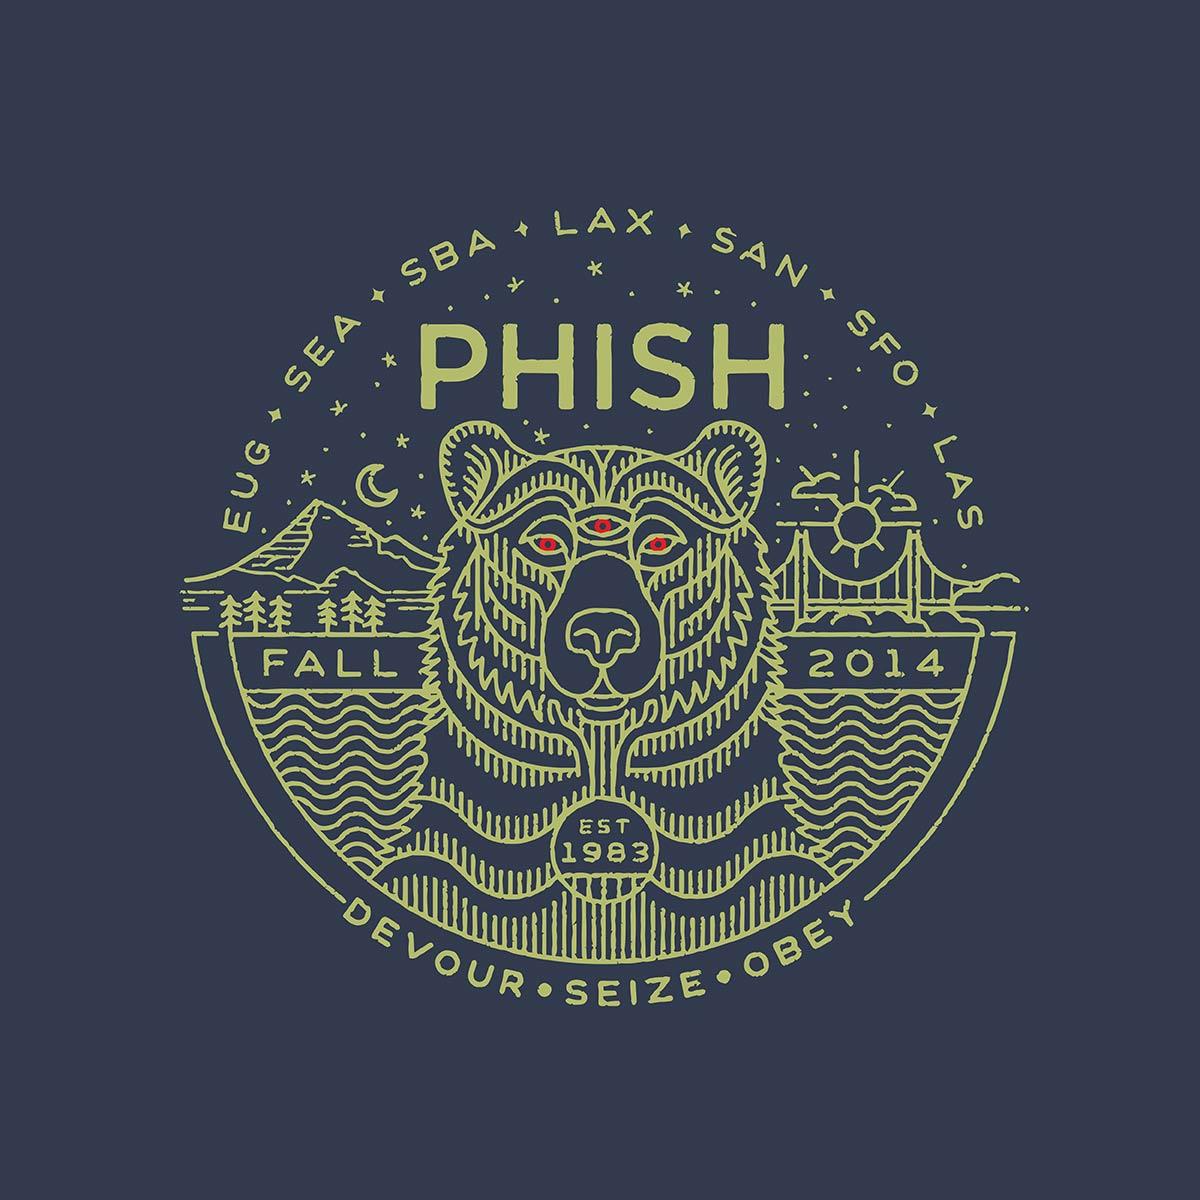 PHISH-STEELY-01.jpg